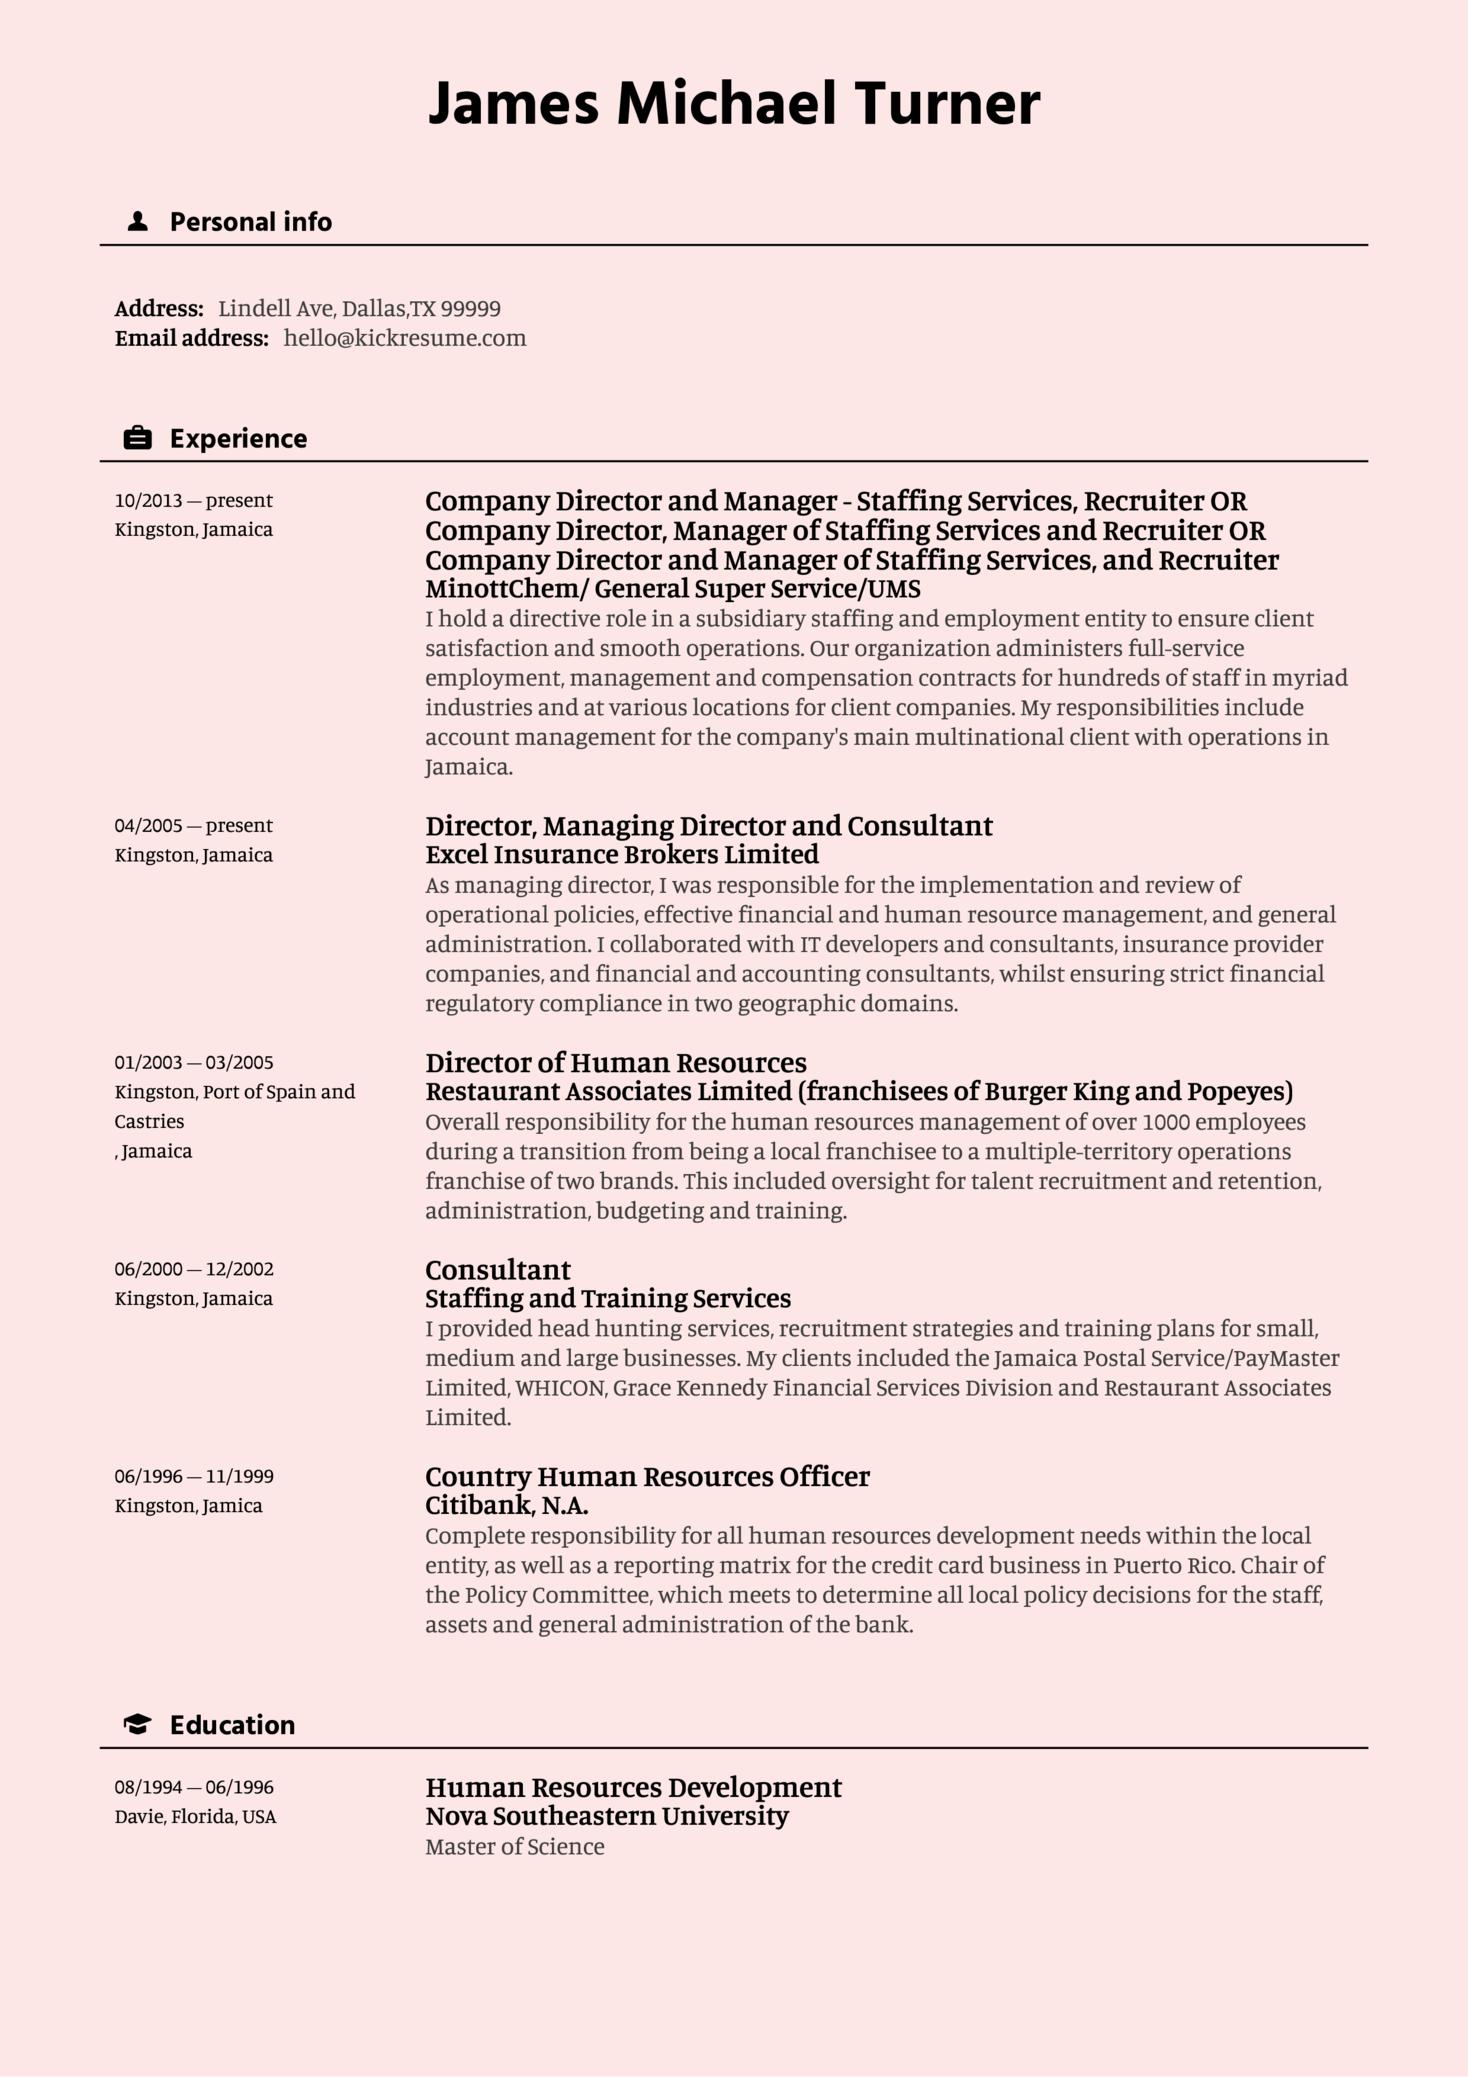 Data Analyst Resume Sample (Part 1)